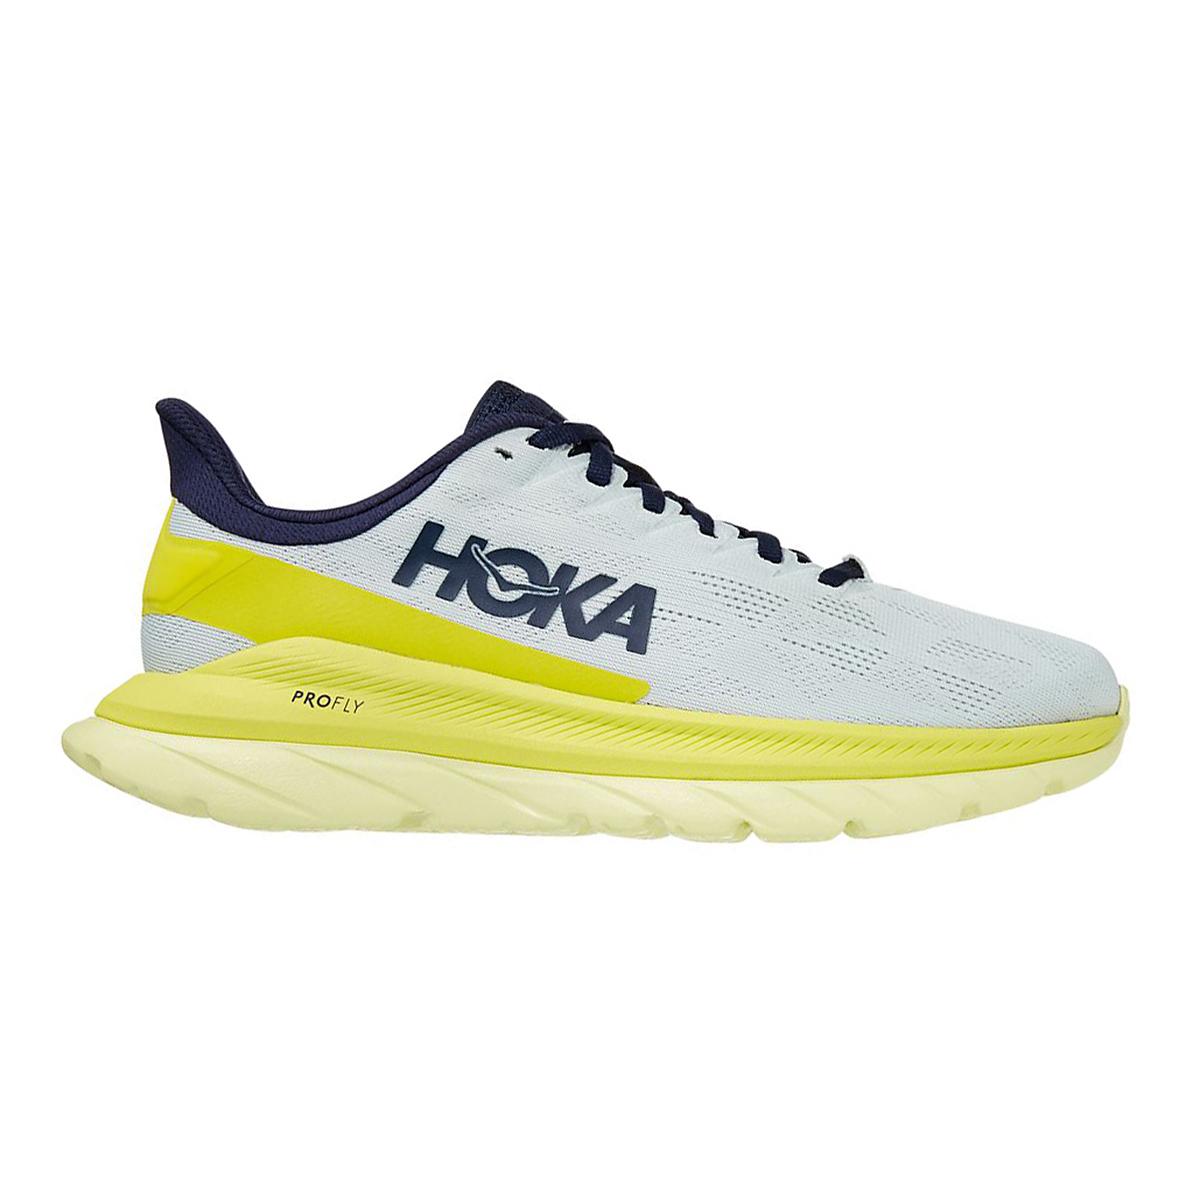 Women's Hoka One One Mach 4 Running Shoe - Color: Blue Flower/Citrus - Size: 5 - Width: Regular, Blue Flower/Citrus, large, image 1